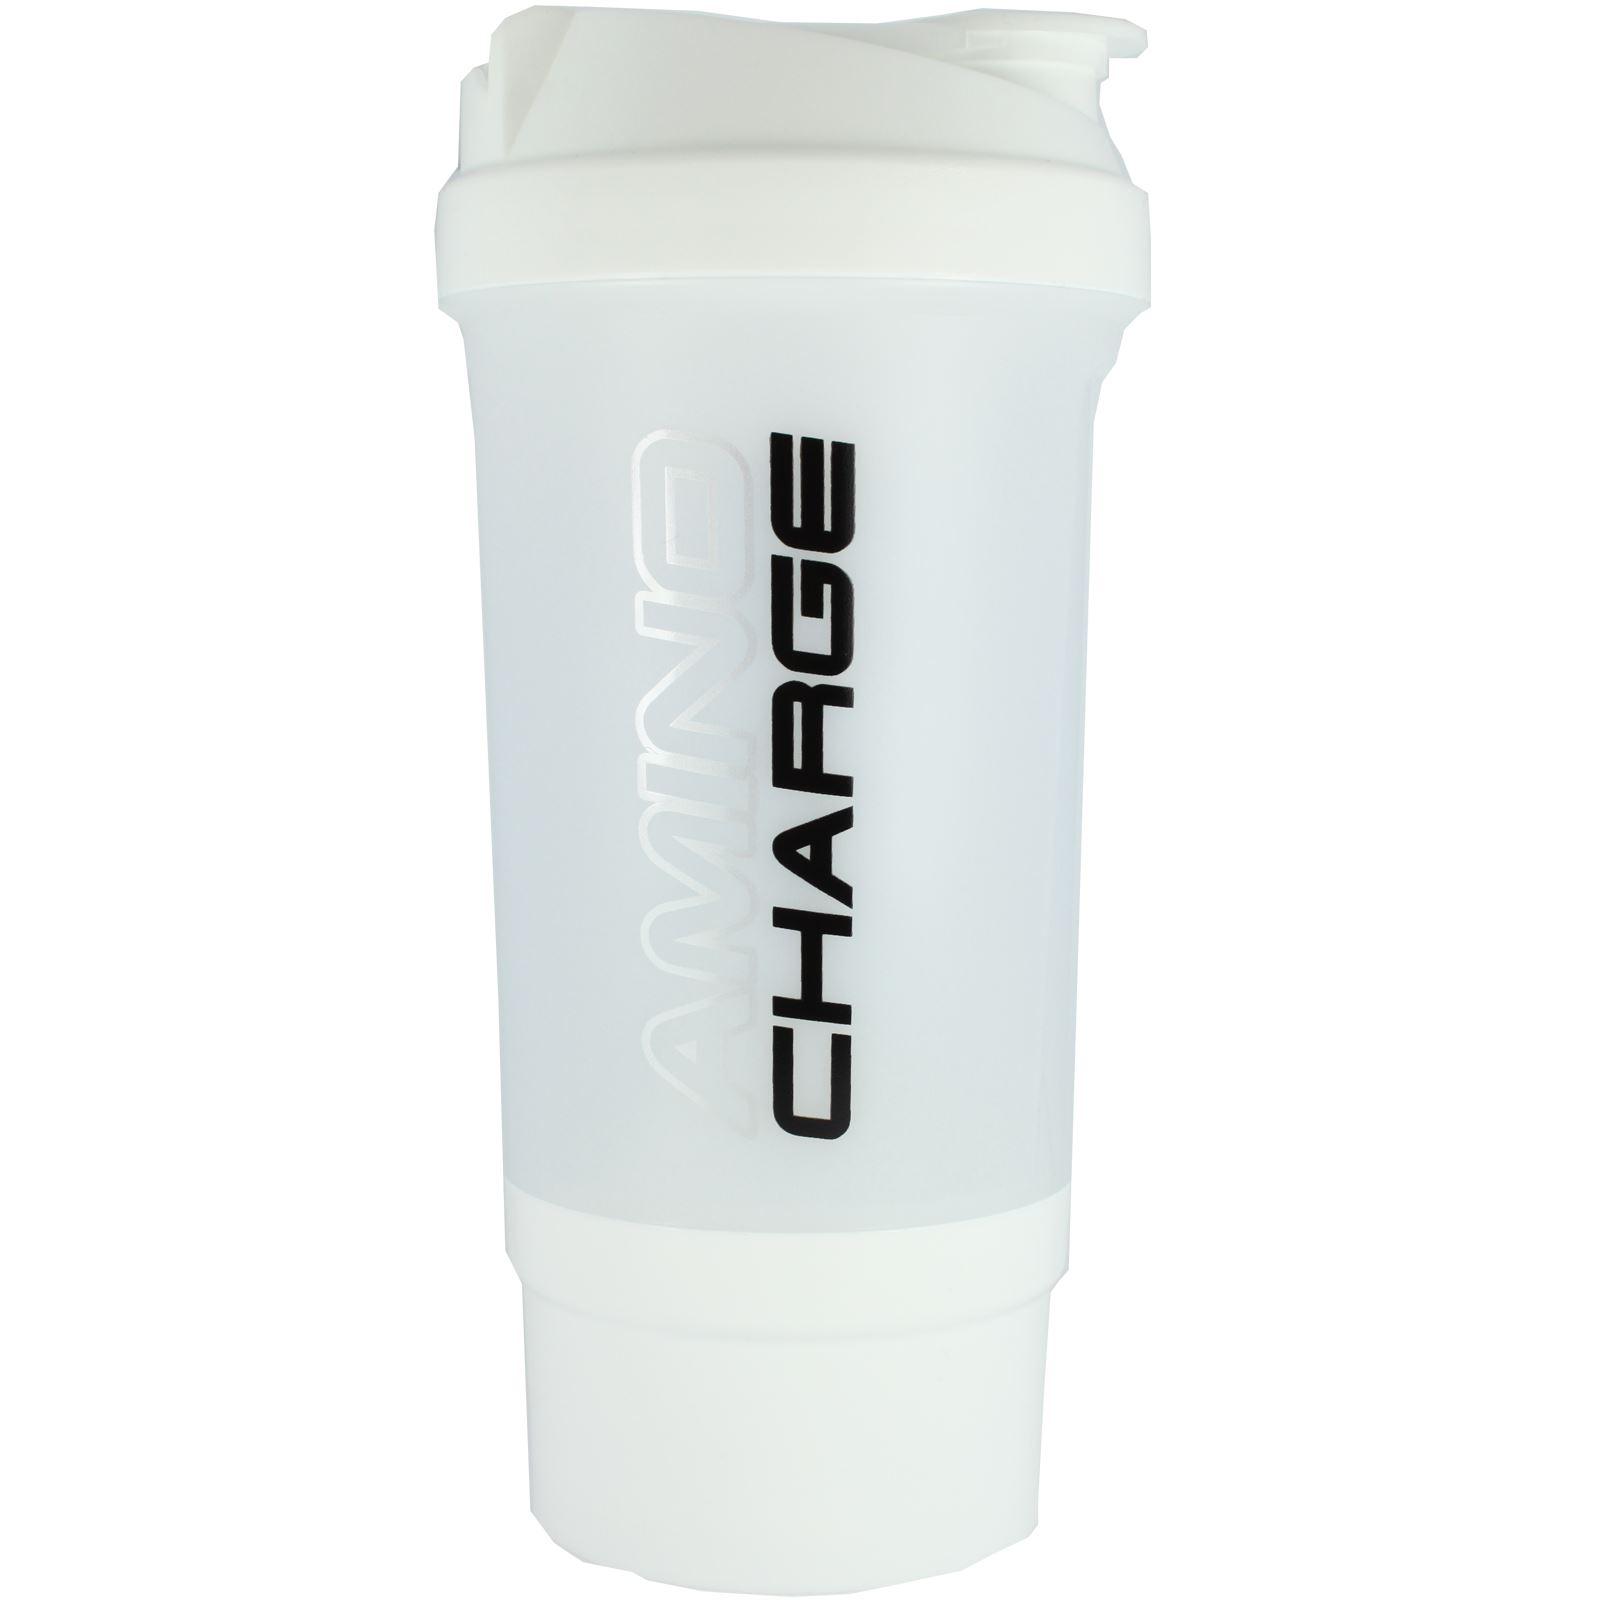 Scitec Nutrition Protein Shaker Bottle 500ml Shake Mixer ...